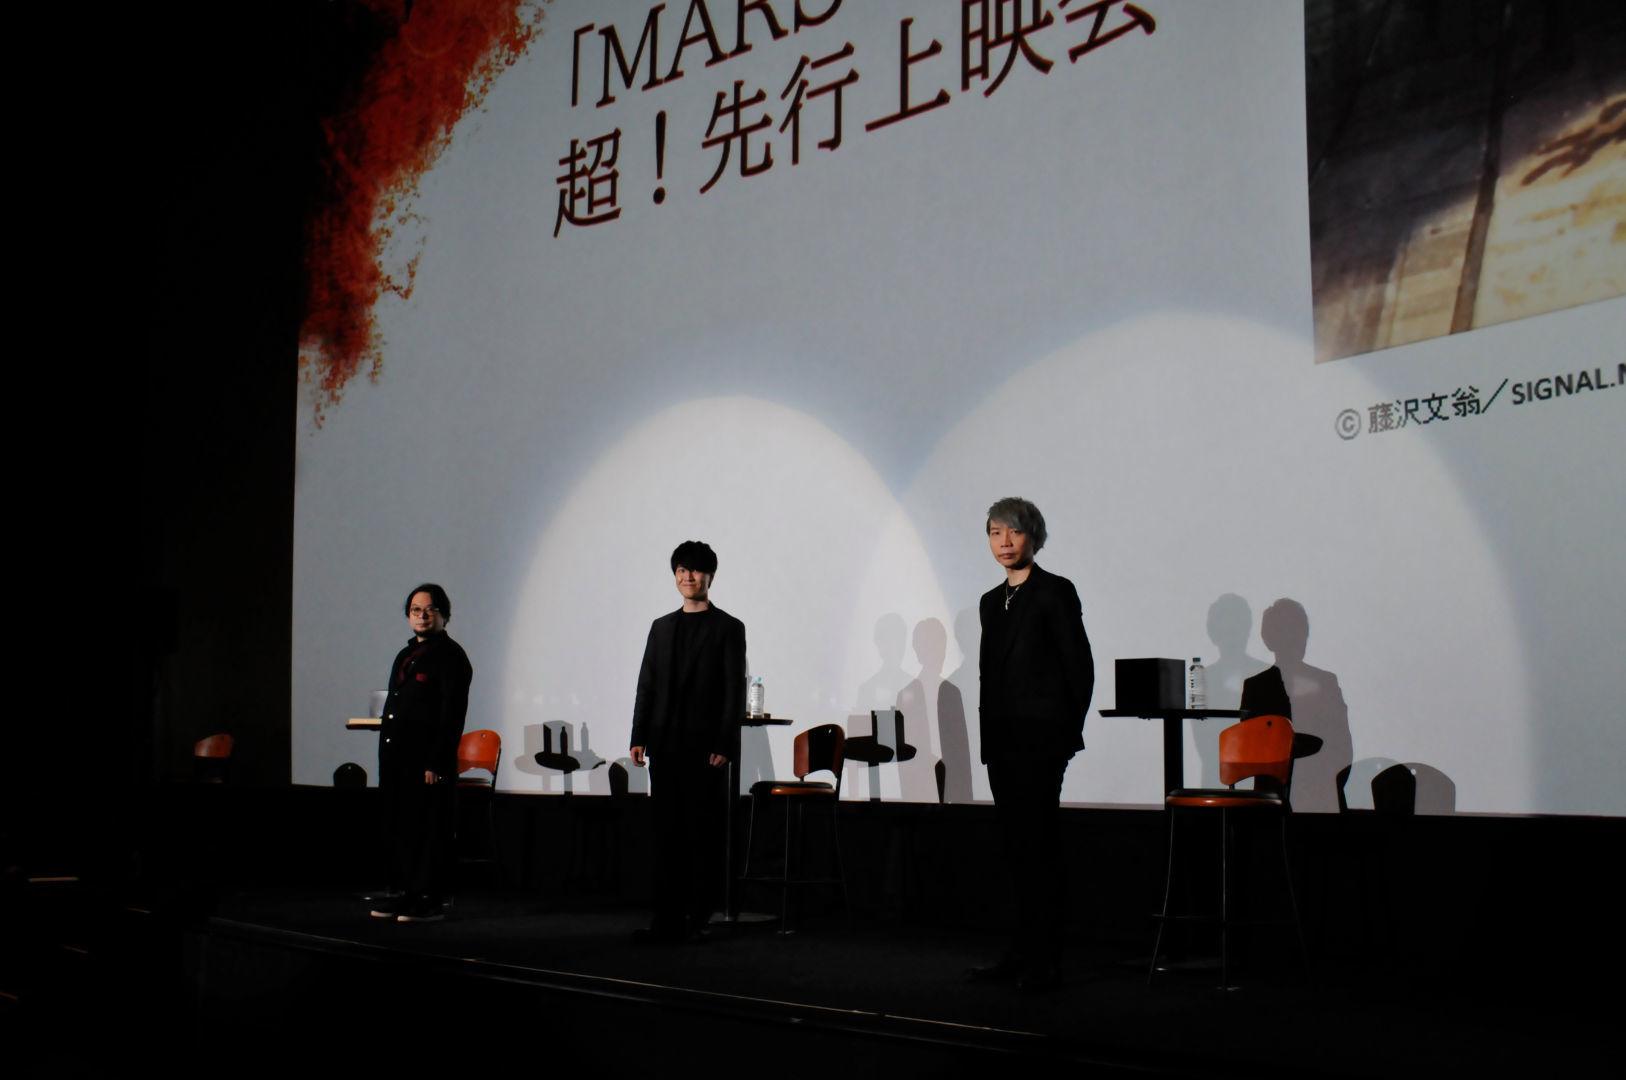 (C) 藤沢文翁/SIGNAL.MD/MARS RED製作委員会